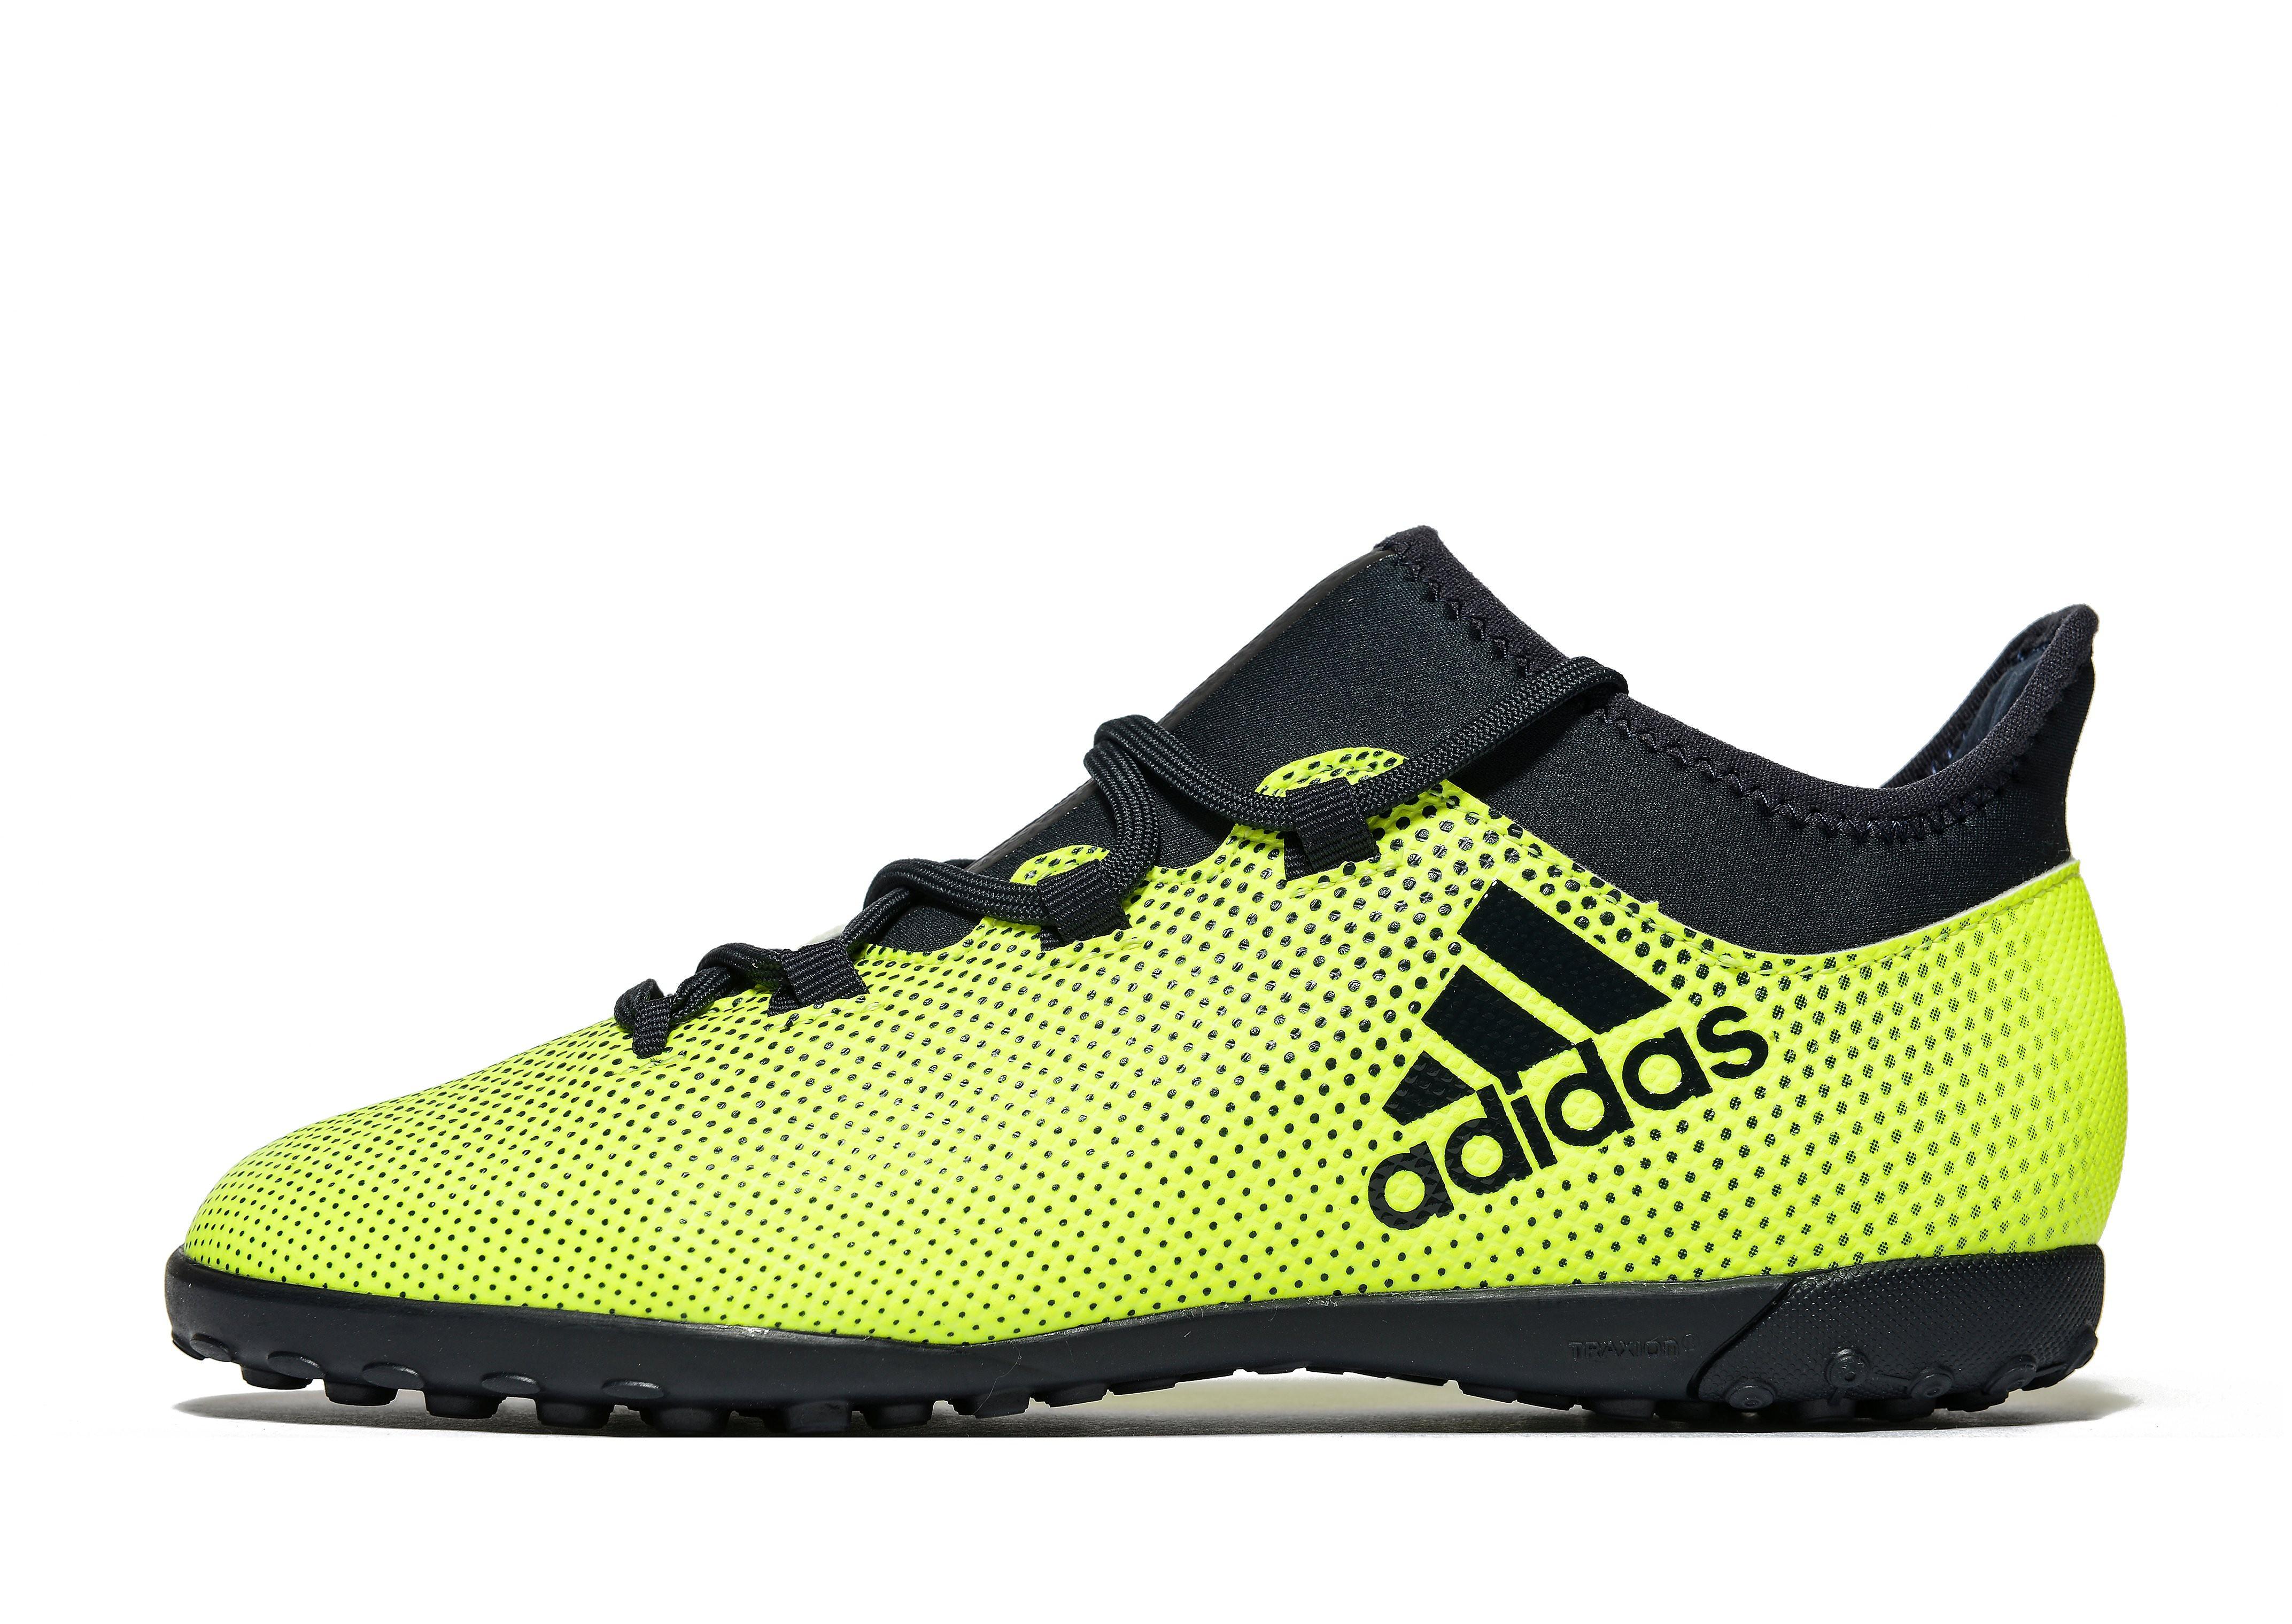 adidas Ocean Storm X 17.3 TF Junior